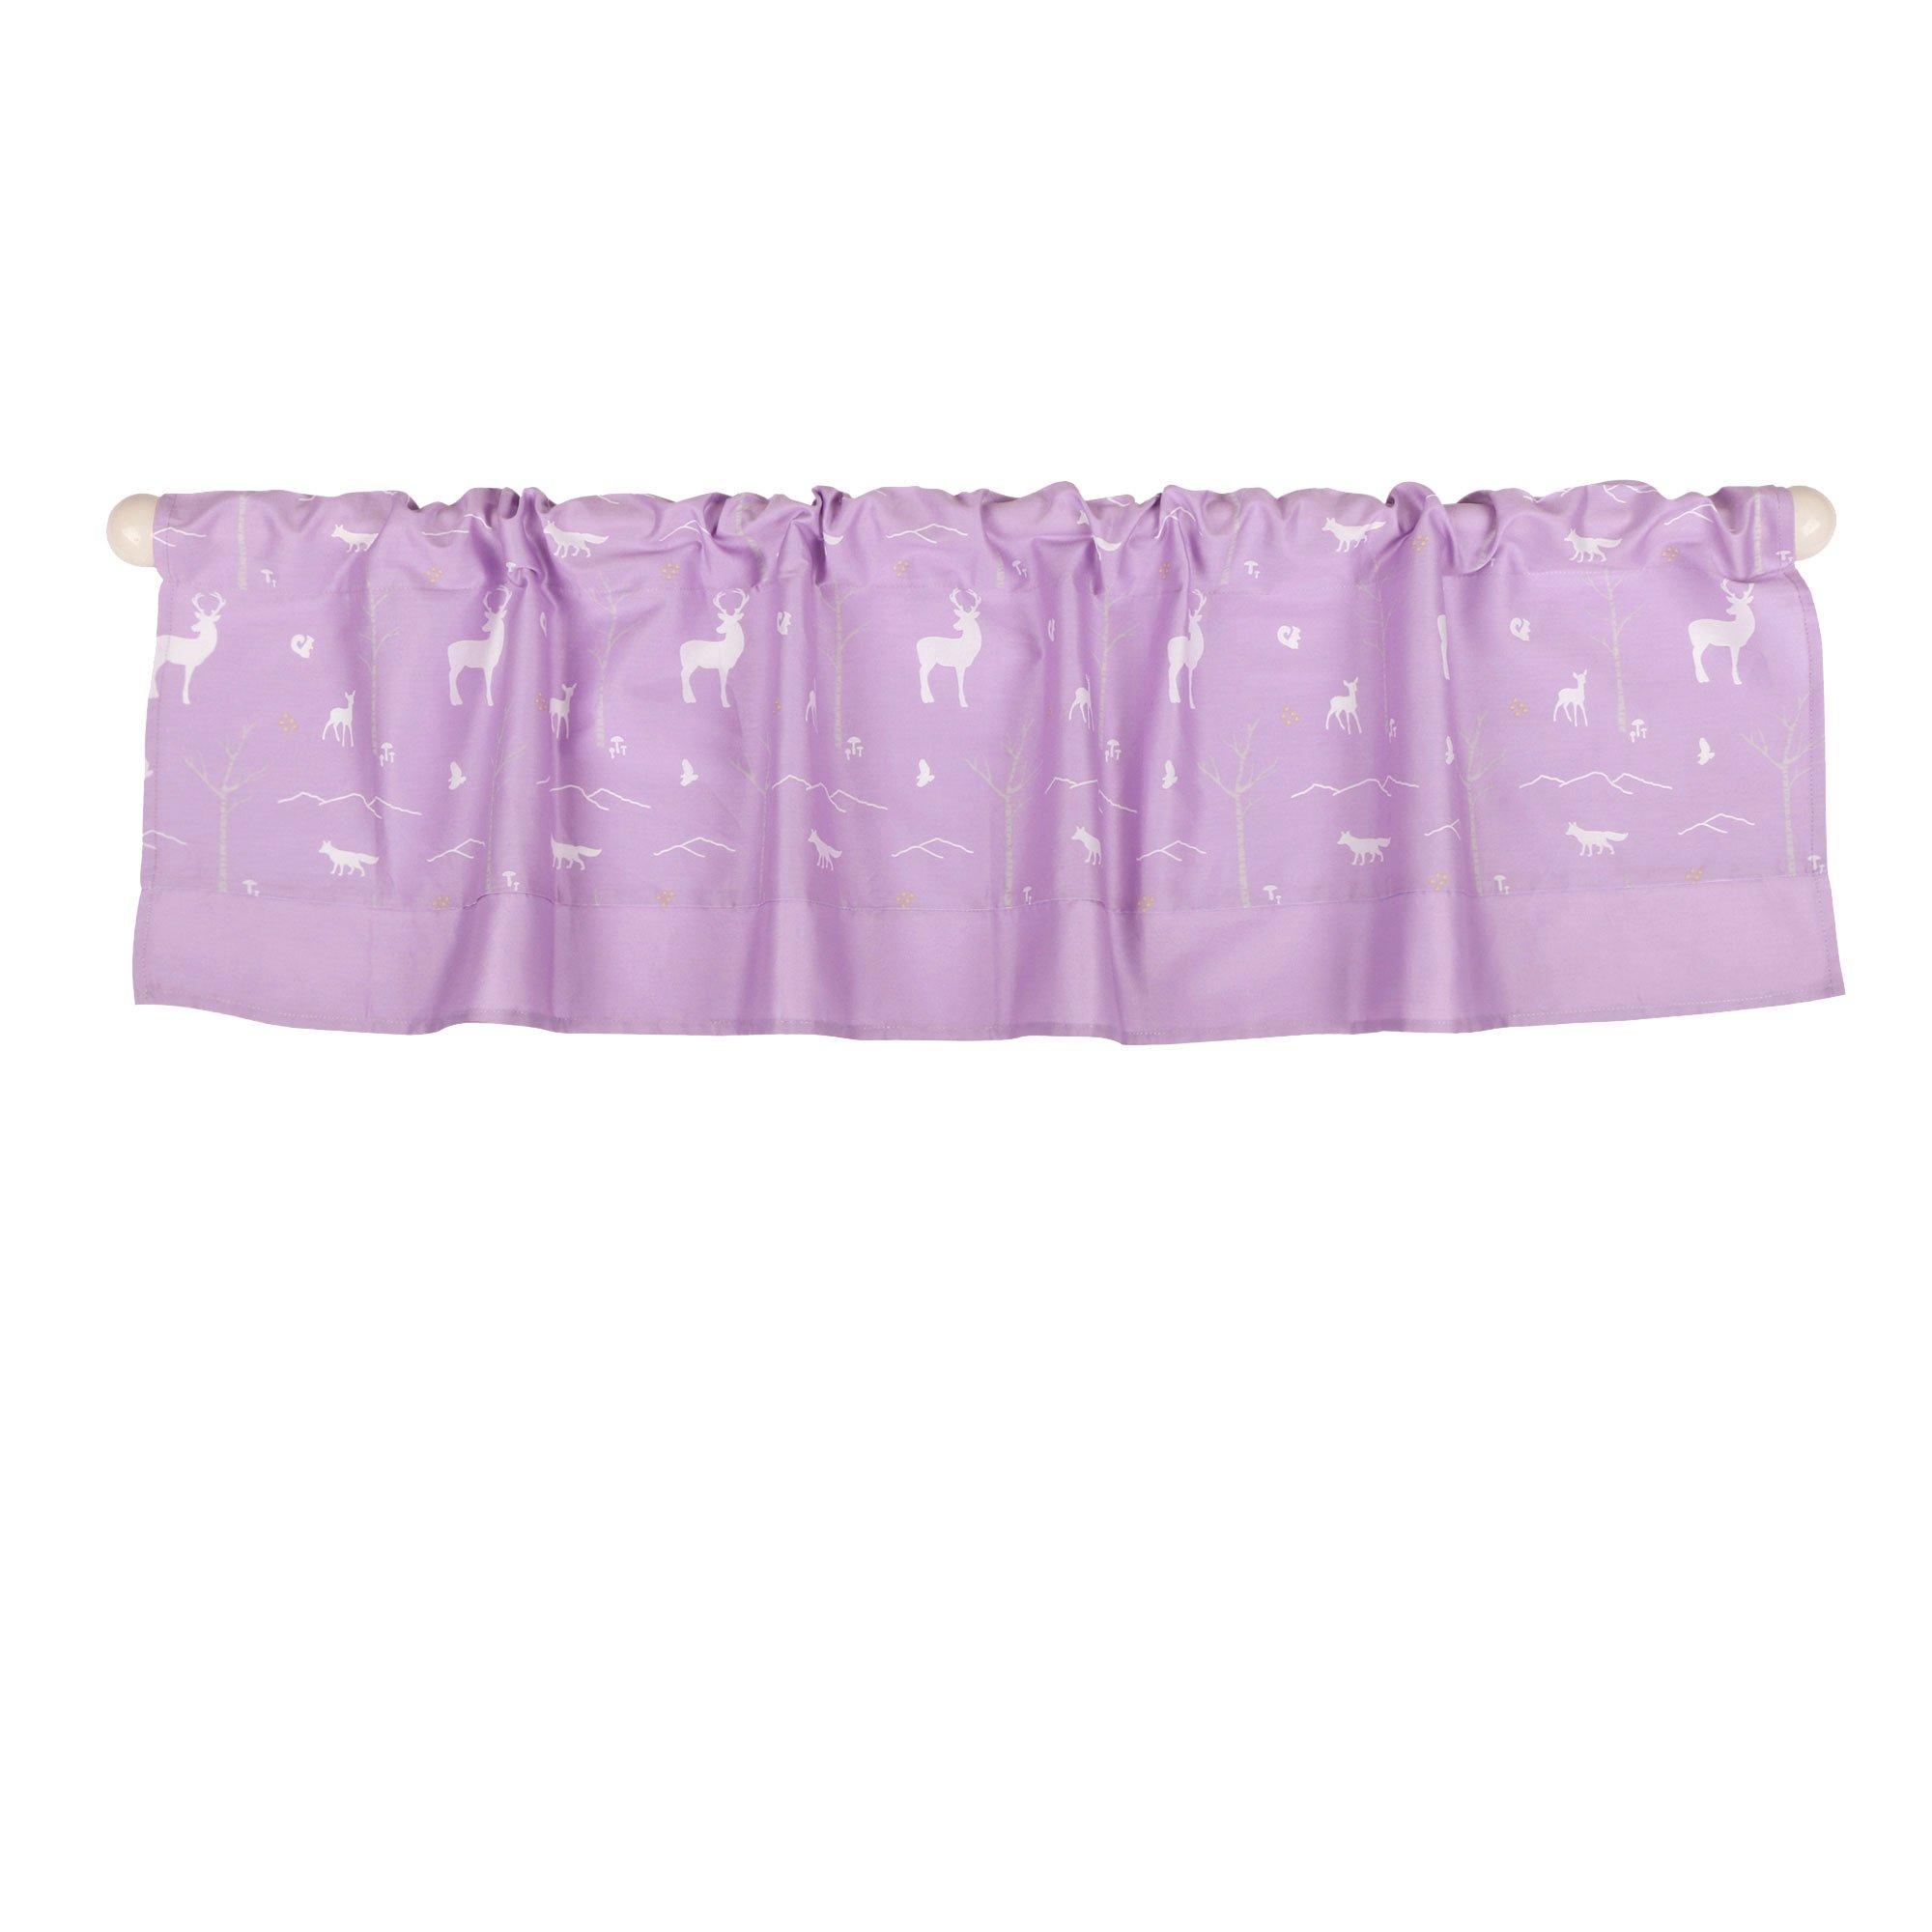 Purple Woodland Tailored Window Valance by The Peanut Shell - 100% Cotton